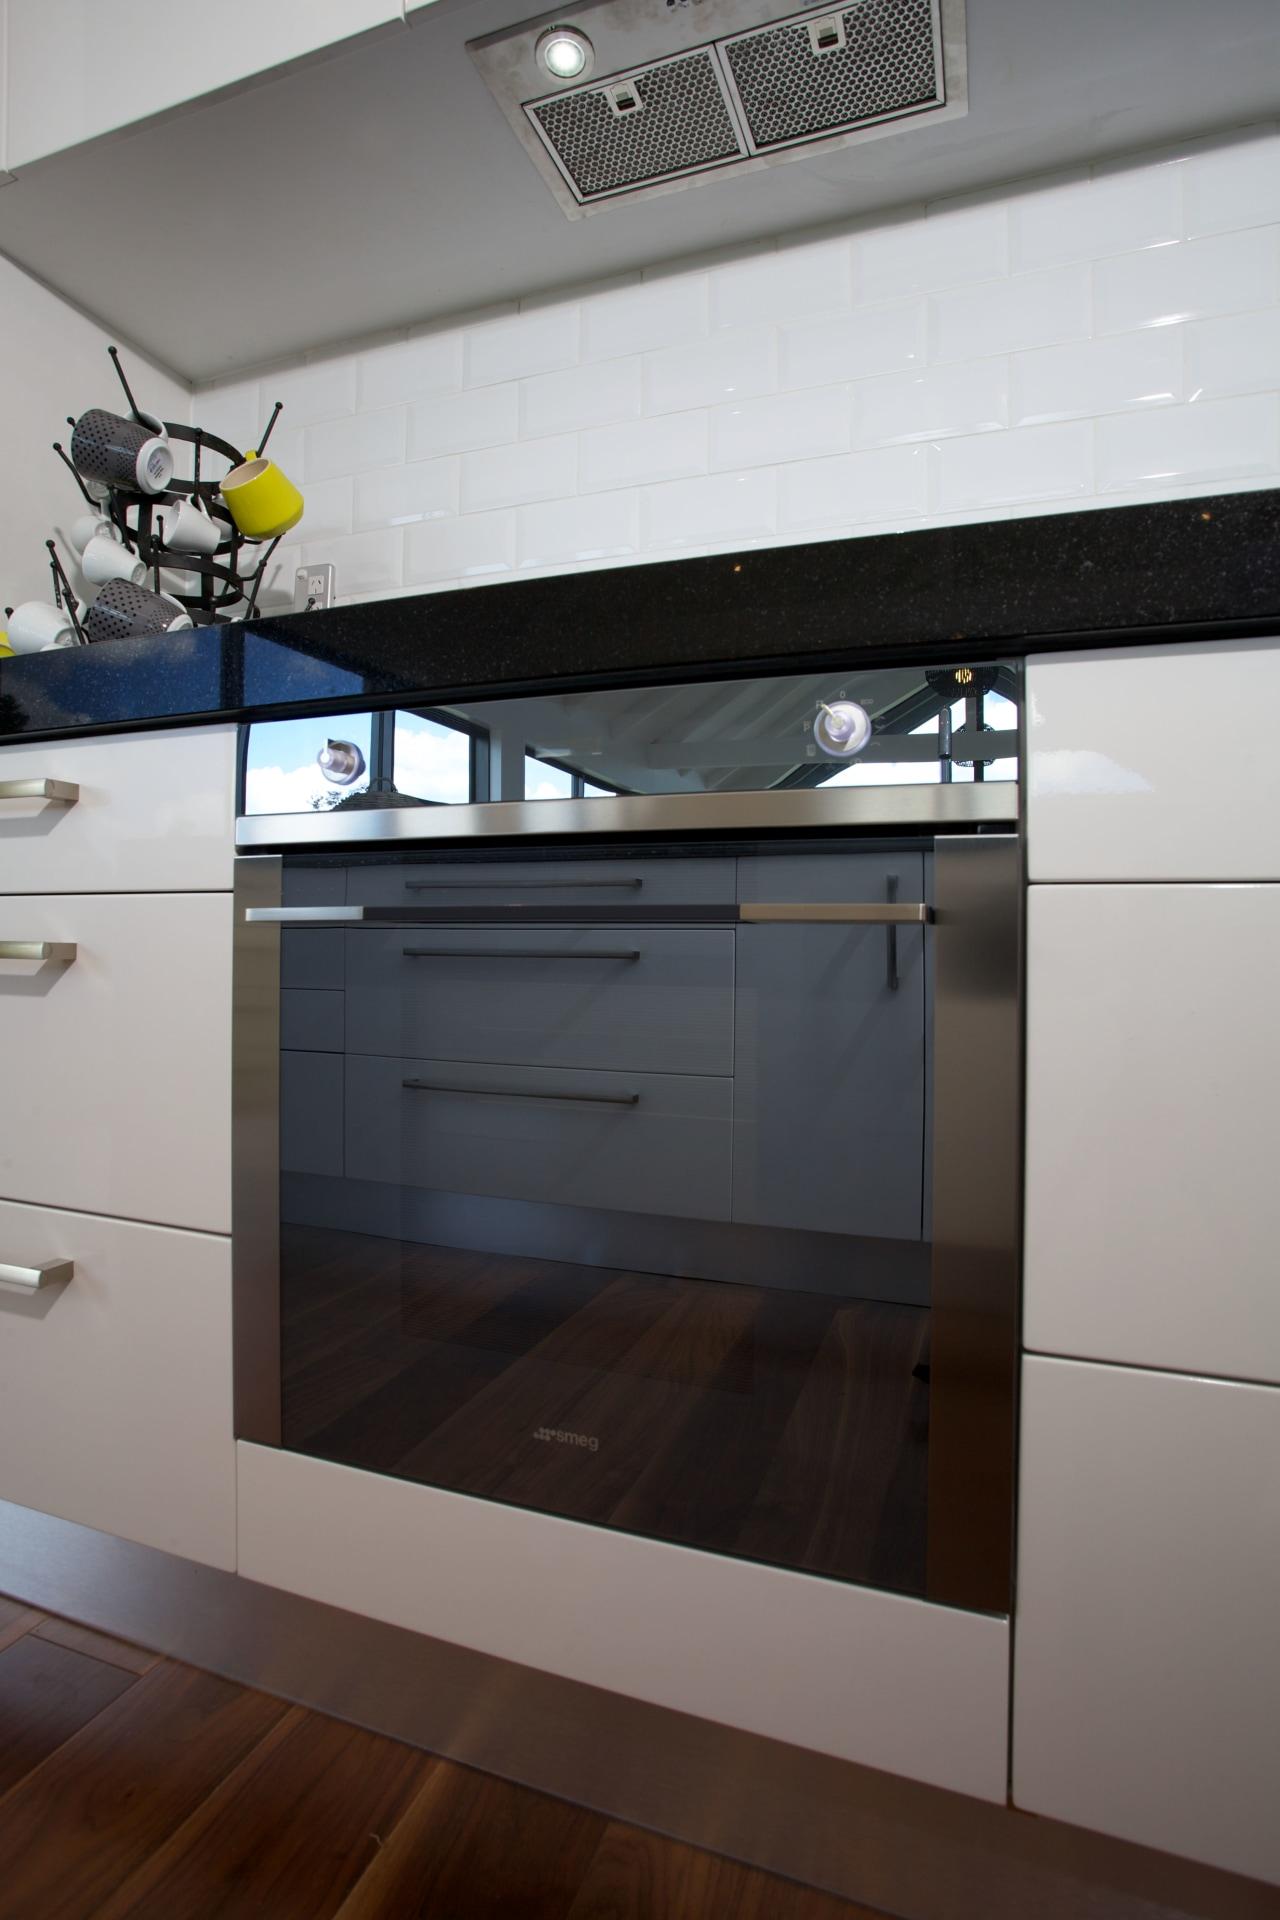 Contemporary kitchen with Smeg appliances countertop, home appliance, interior design, kitchen, kitchen stove, gray, black